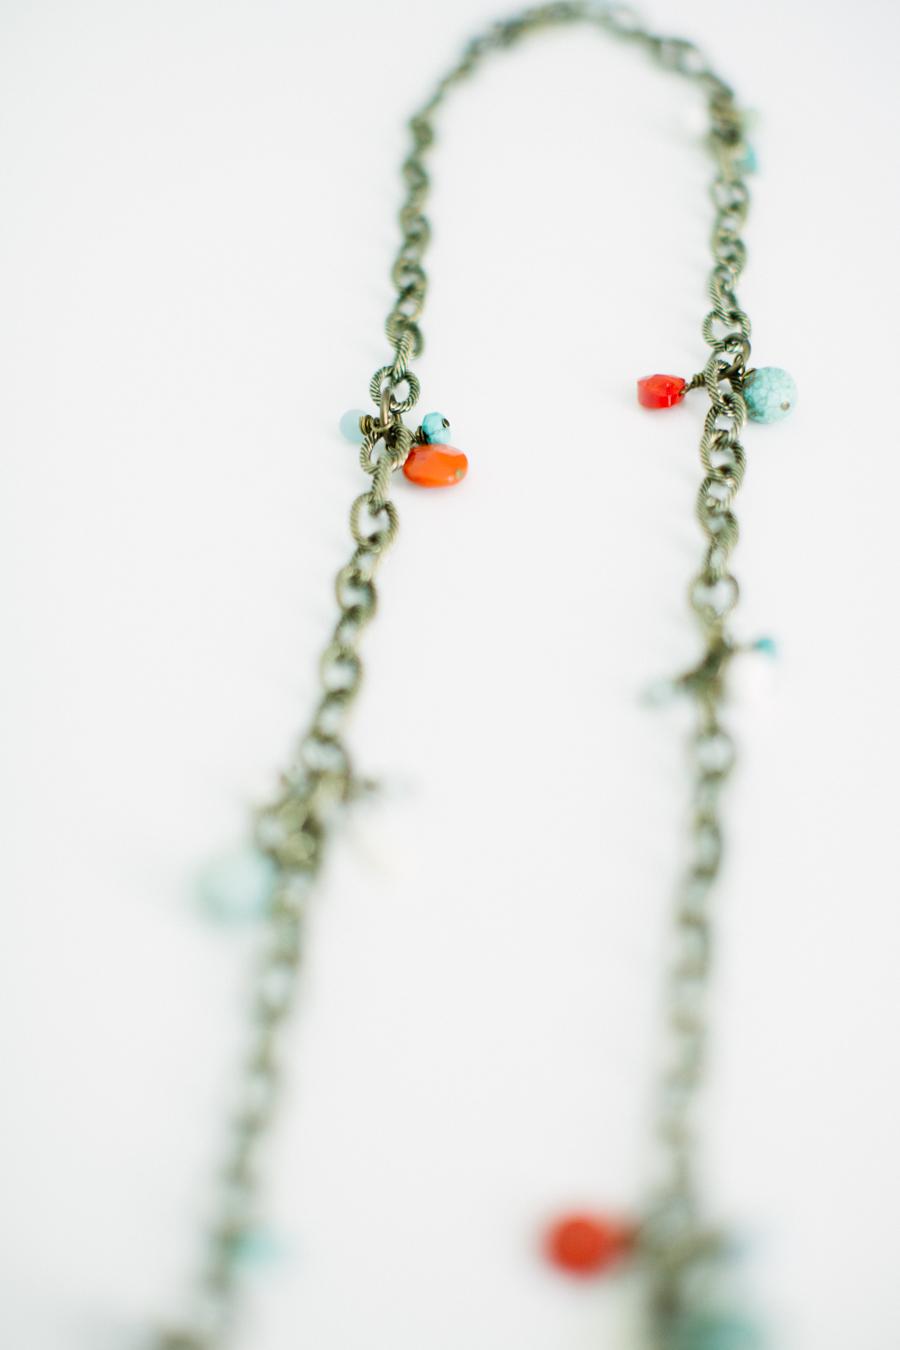 Jewelry-MackenzieKern-15.jpg